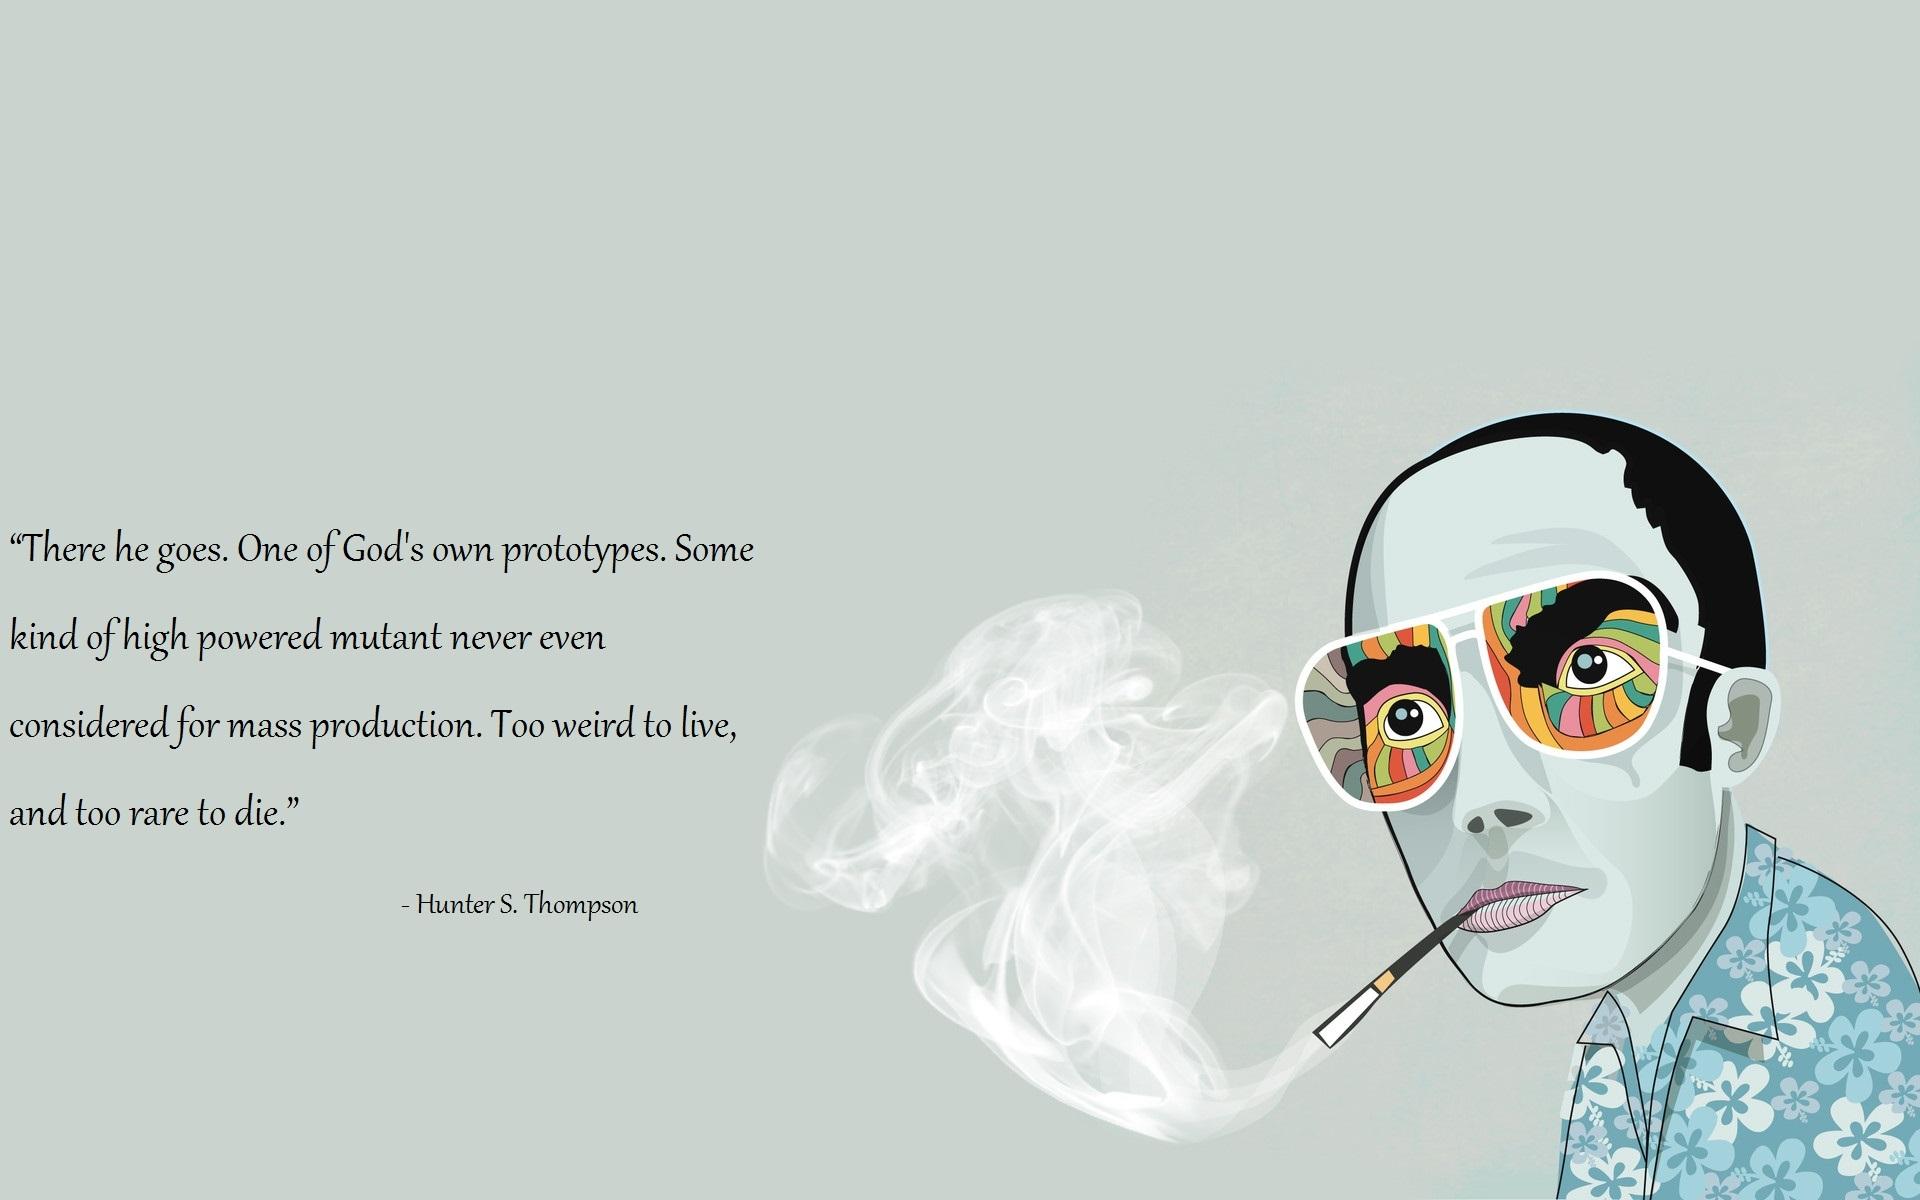 Hd wallpaper john abraham - Hunter S Thompson Quotes Wallpaper Quotesgram